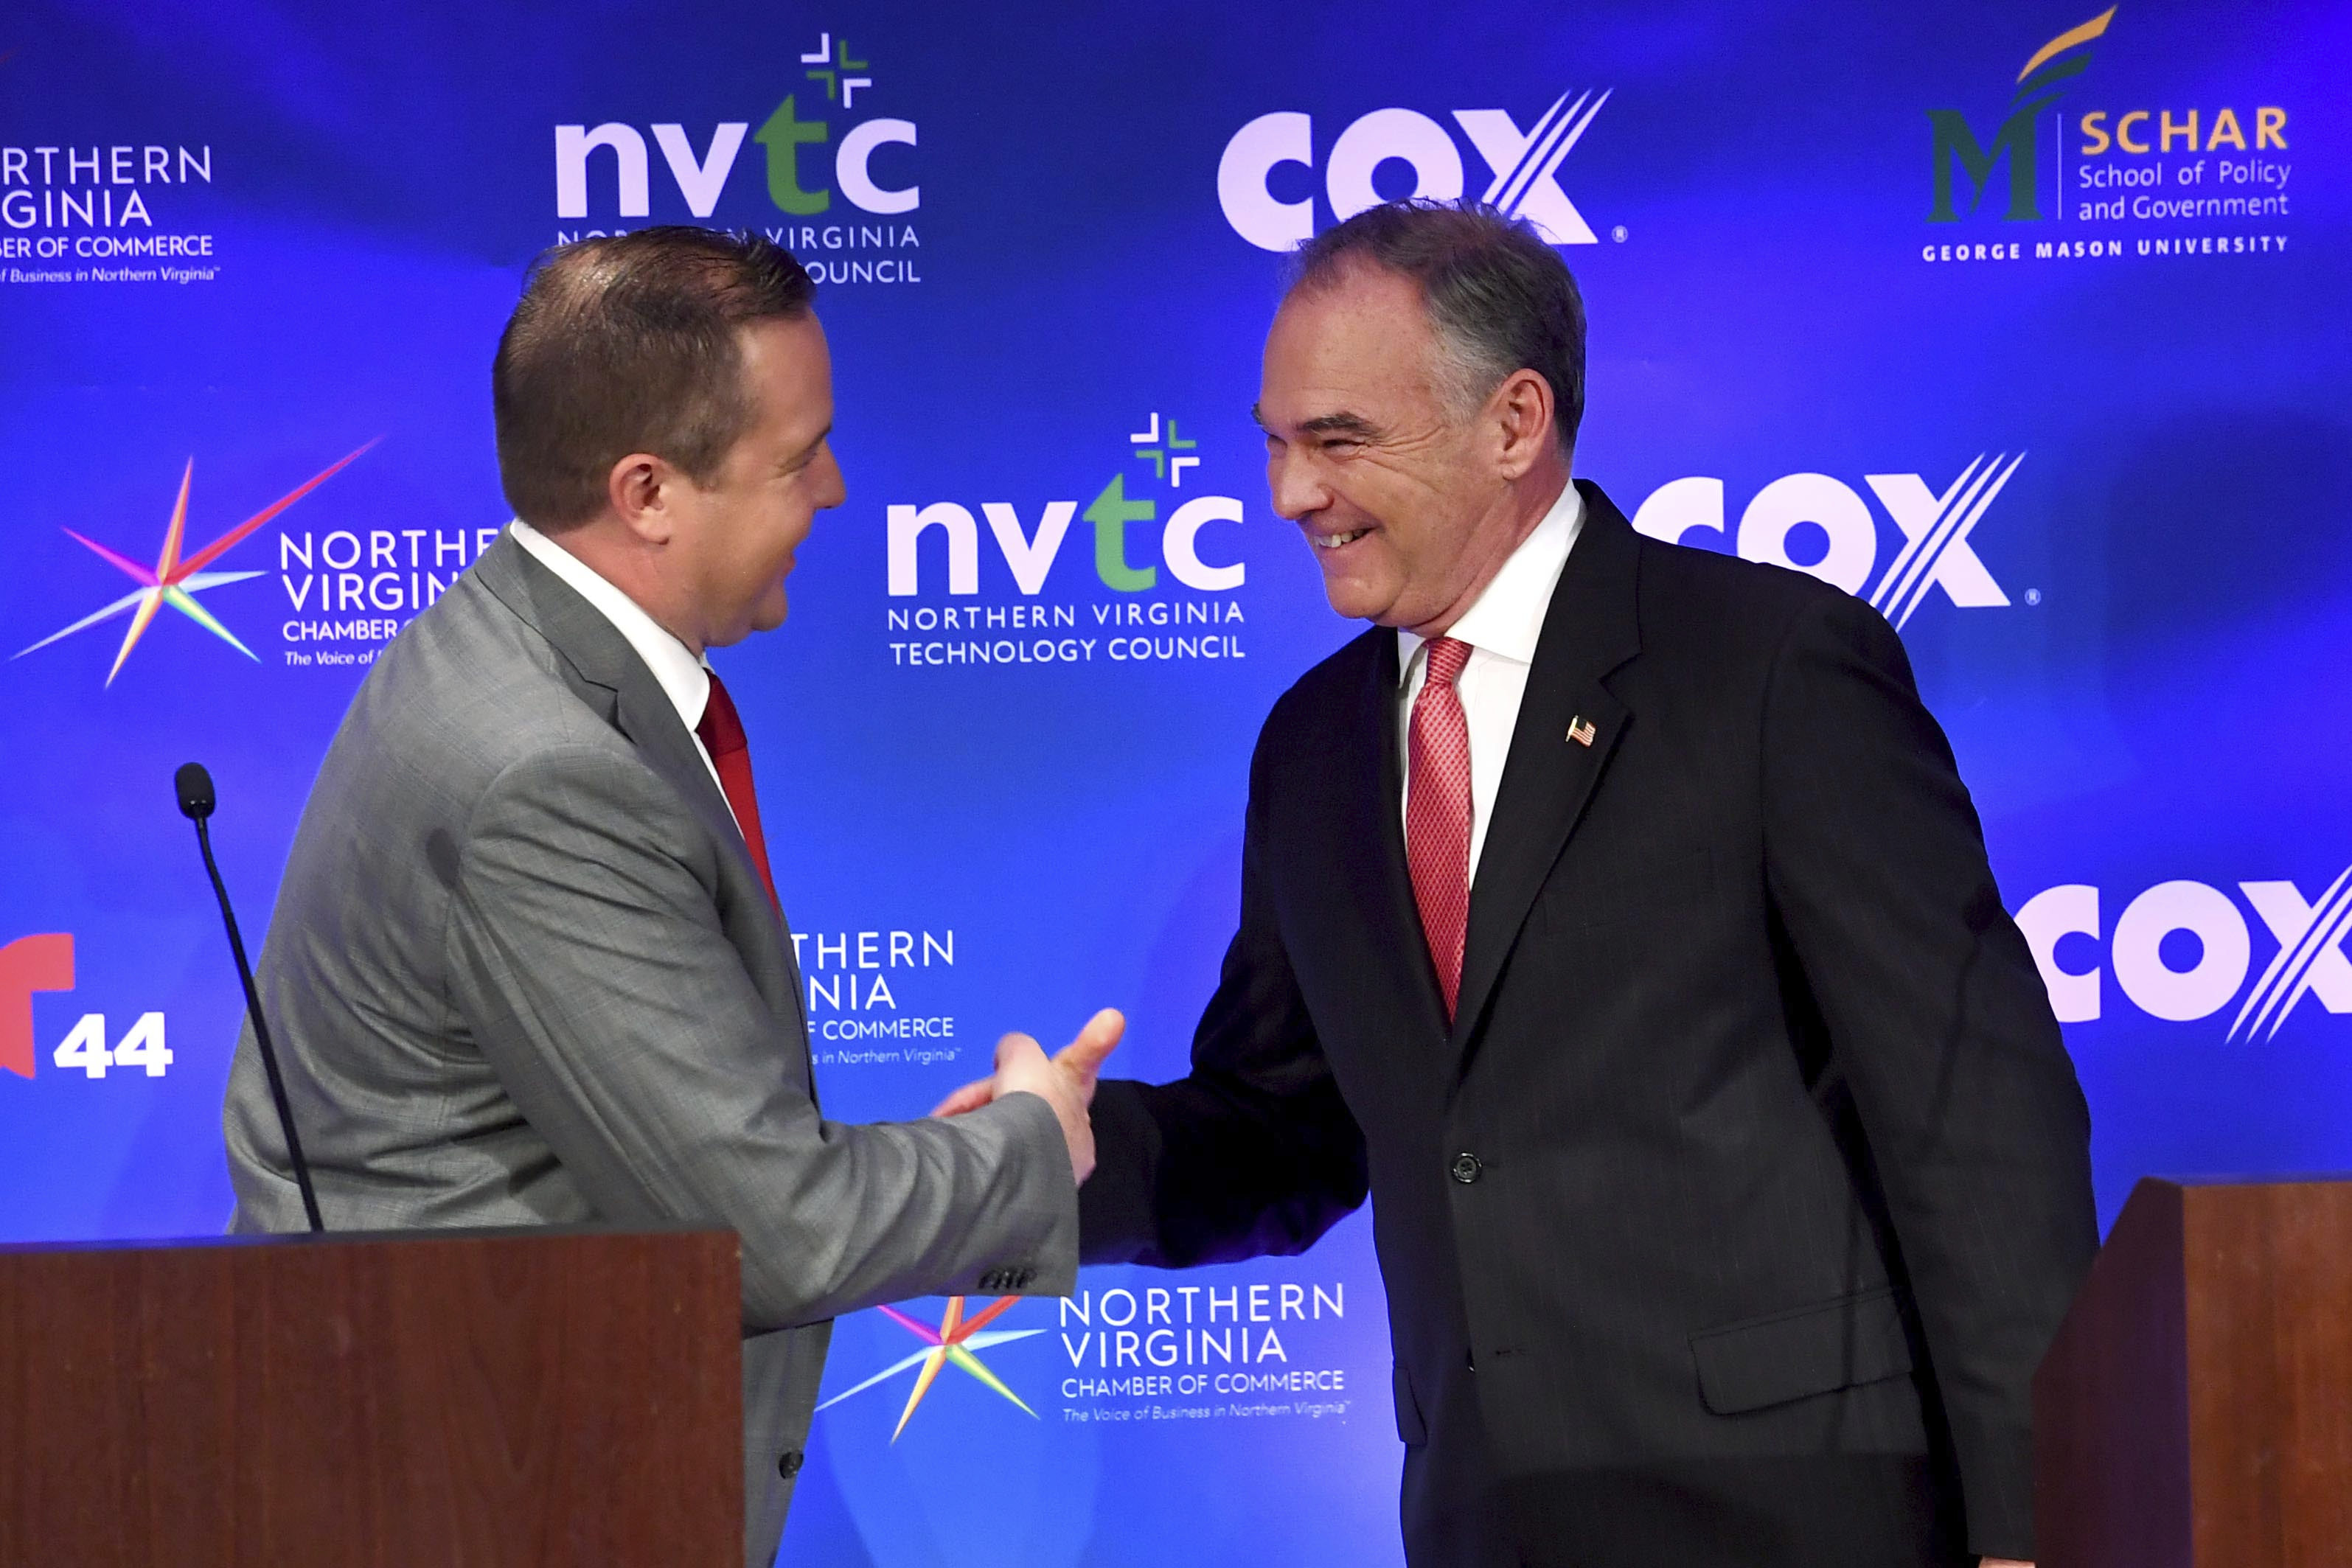 Republican Corey Stewart, left, and Sen. Tim Kaine (D-Va.) shake hands after a debate on Wednesday, Sept. 26, 2018, in Tysons. (Katherine Frey/AP)